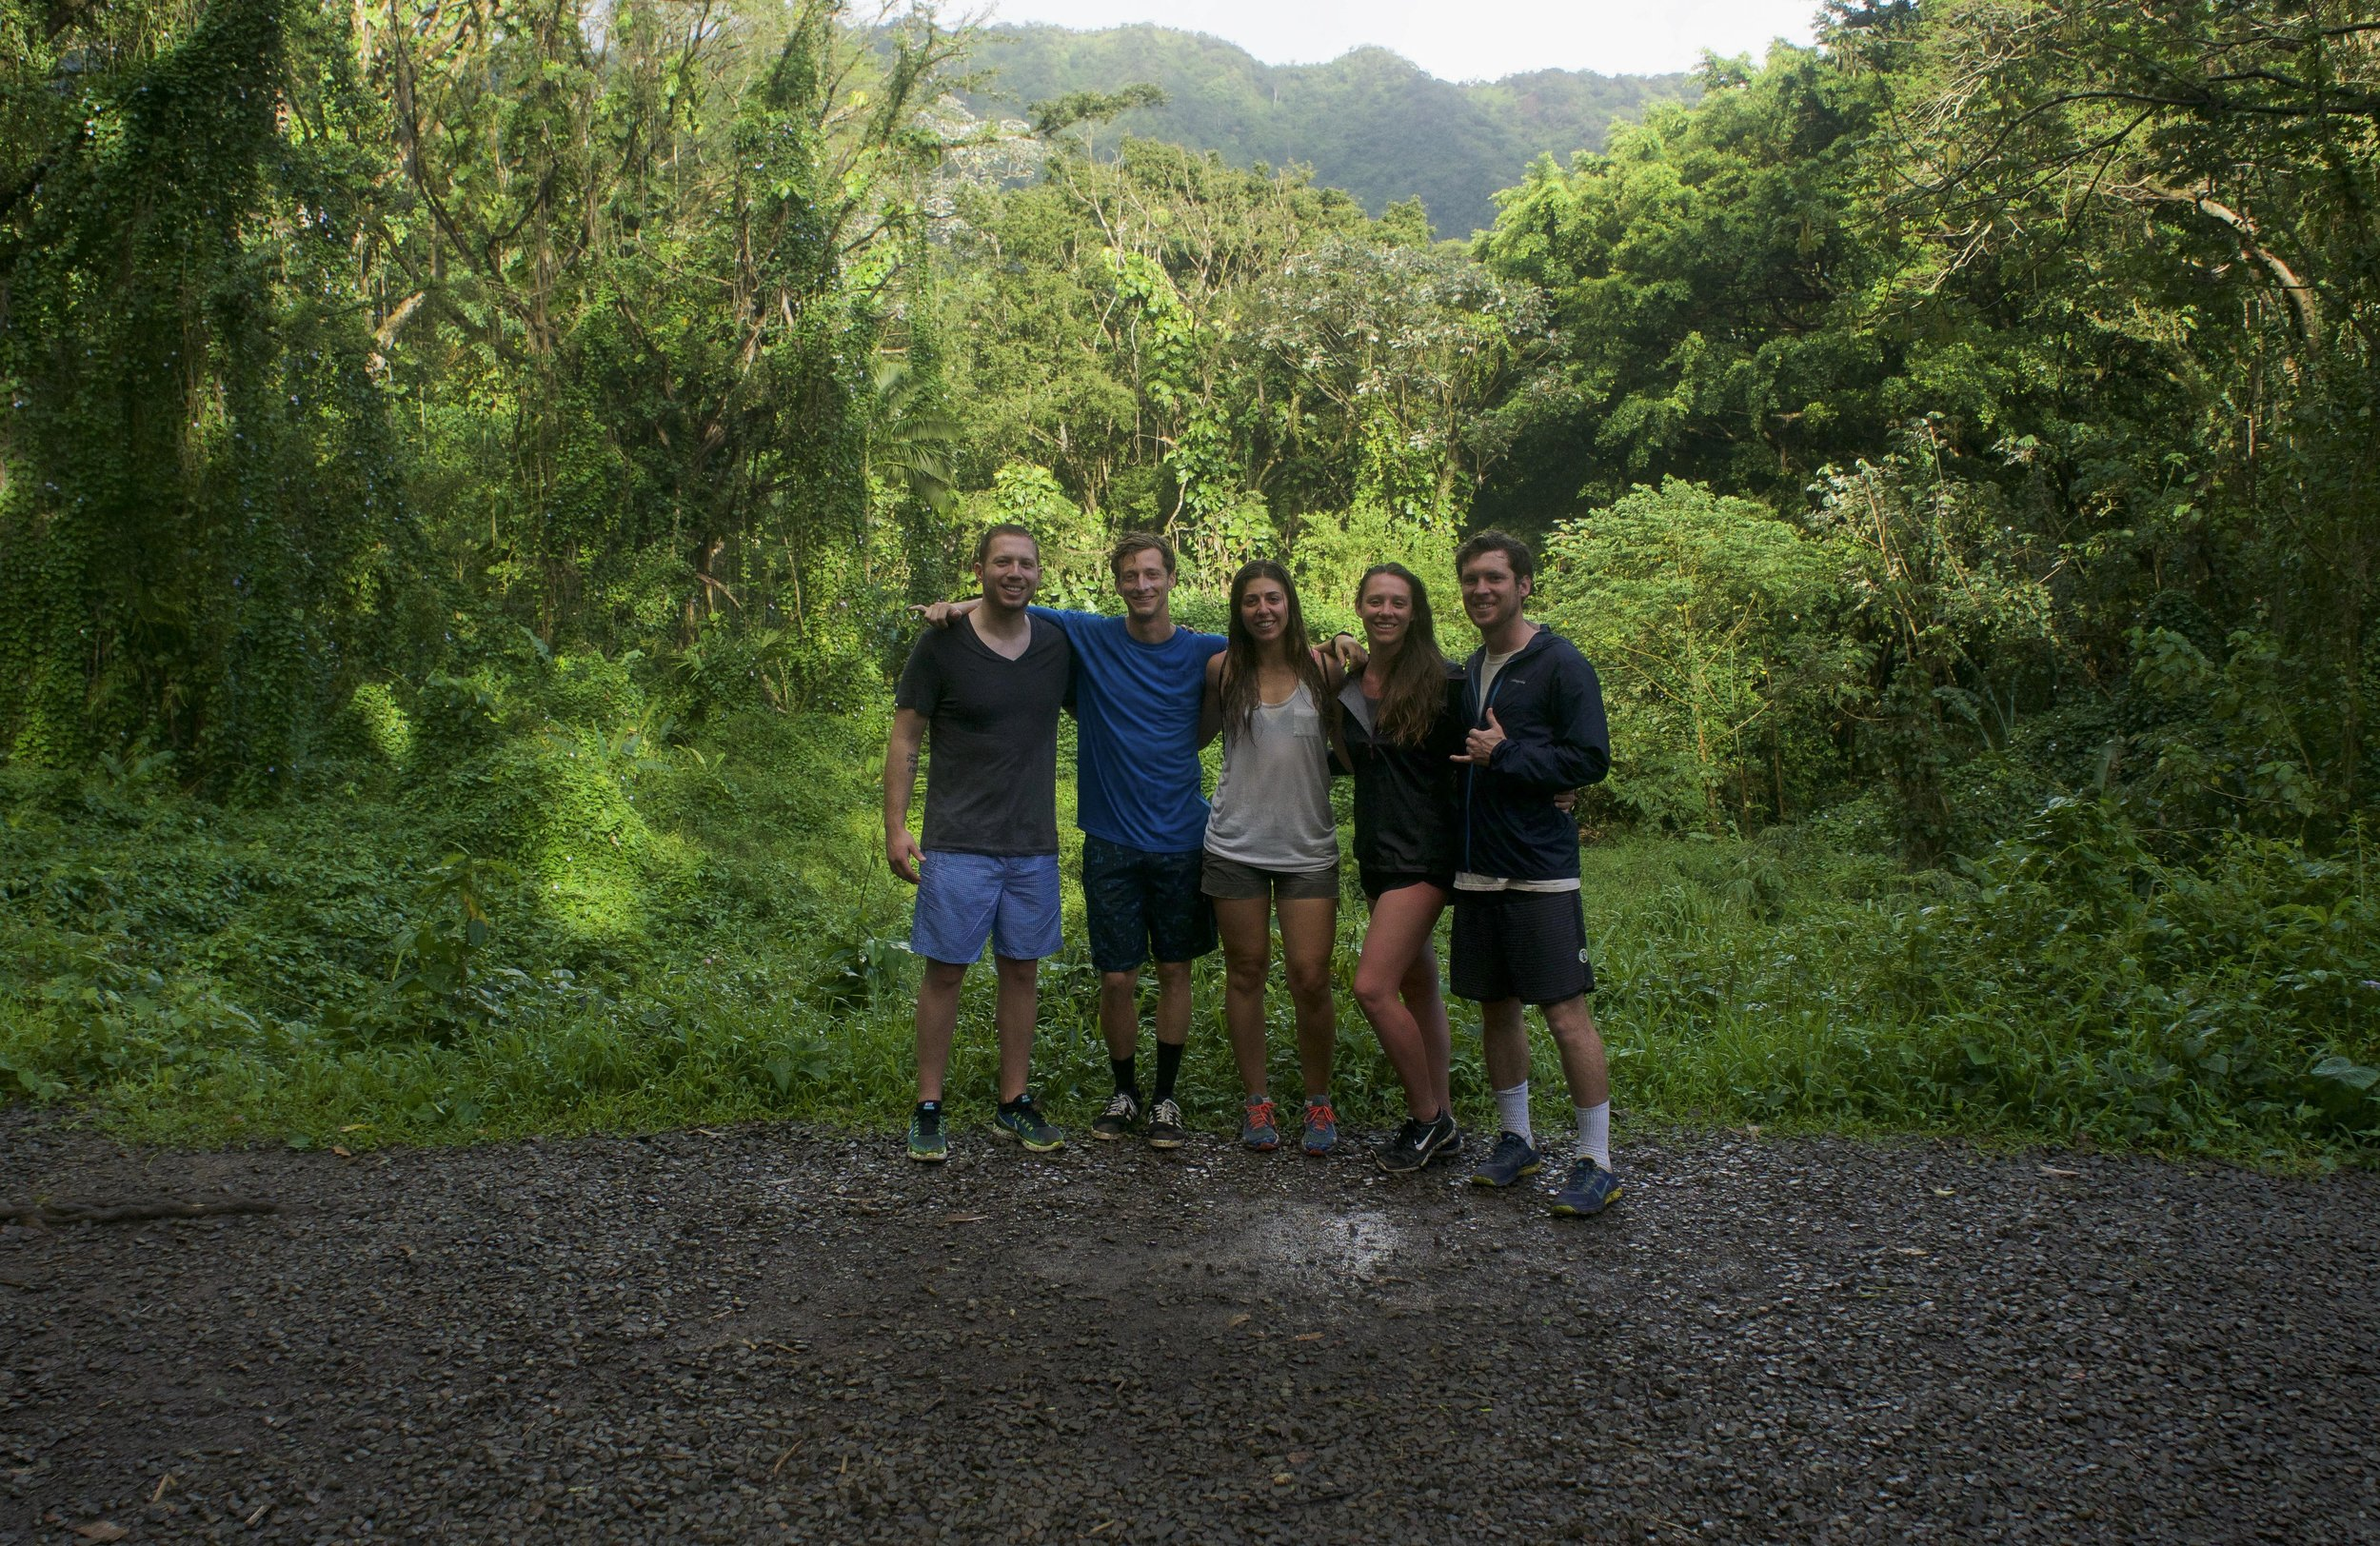 The Oahu 2016 crew. Well, we're here.